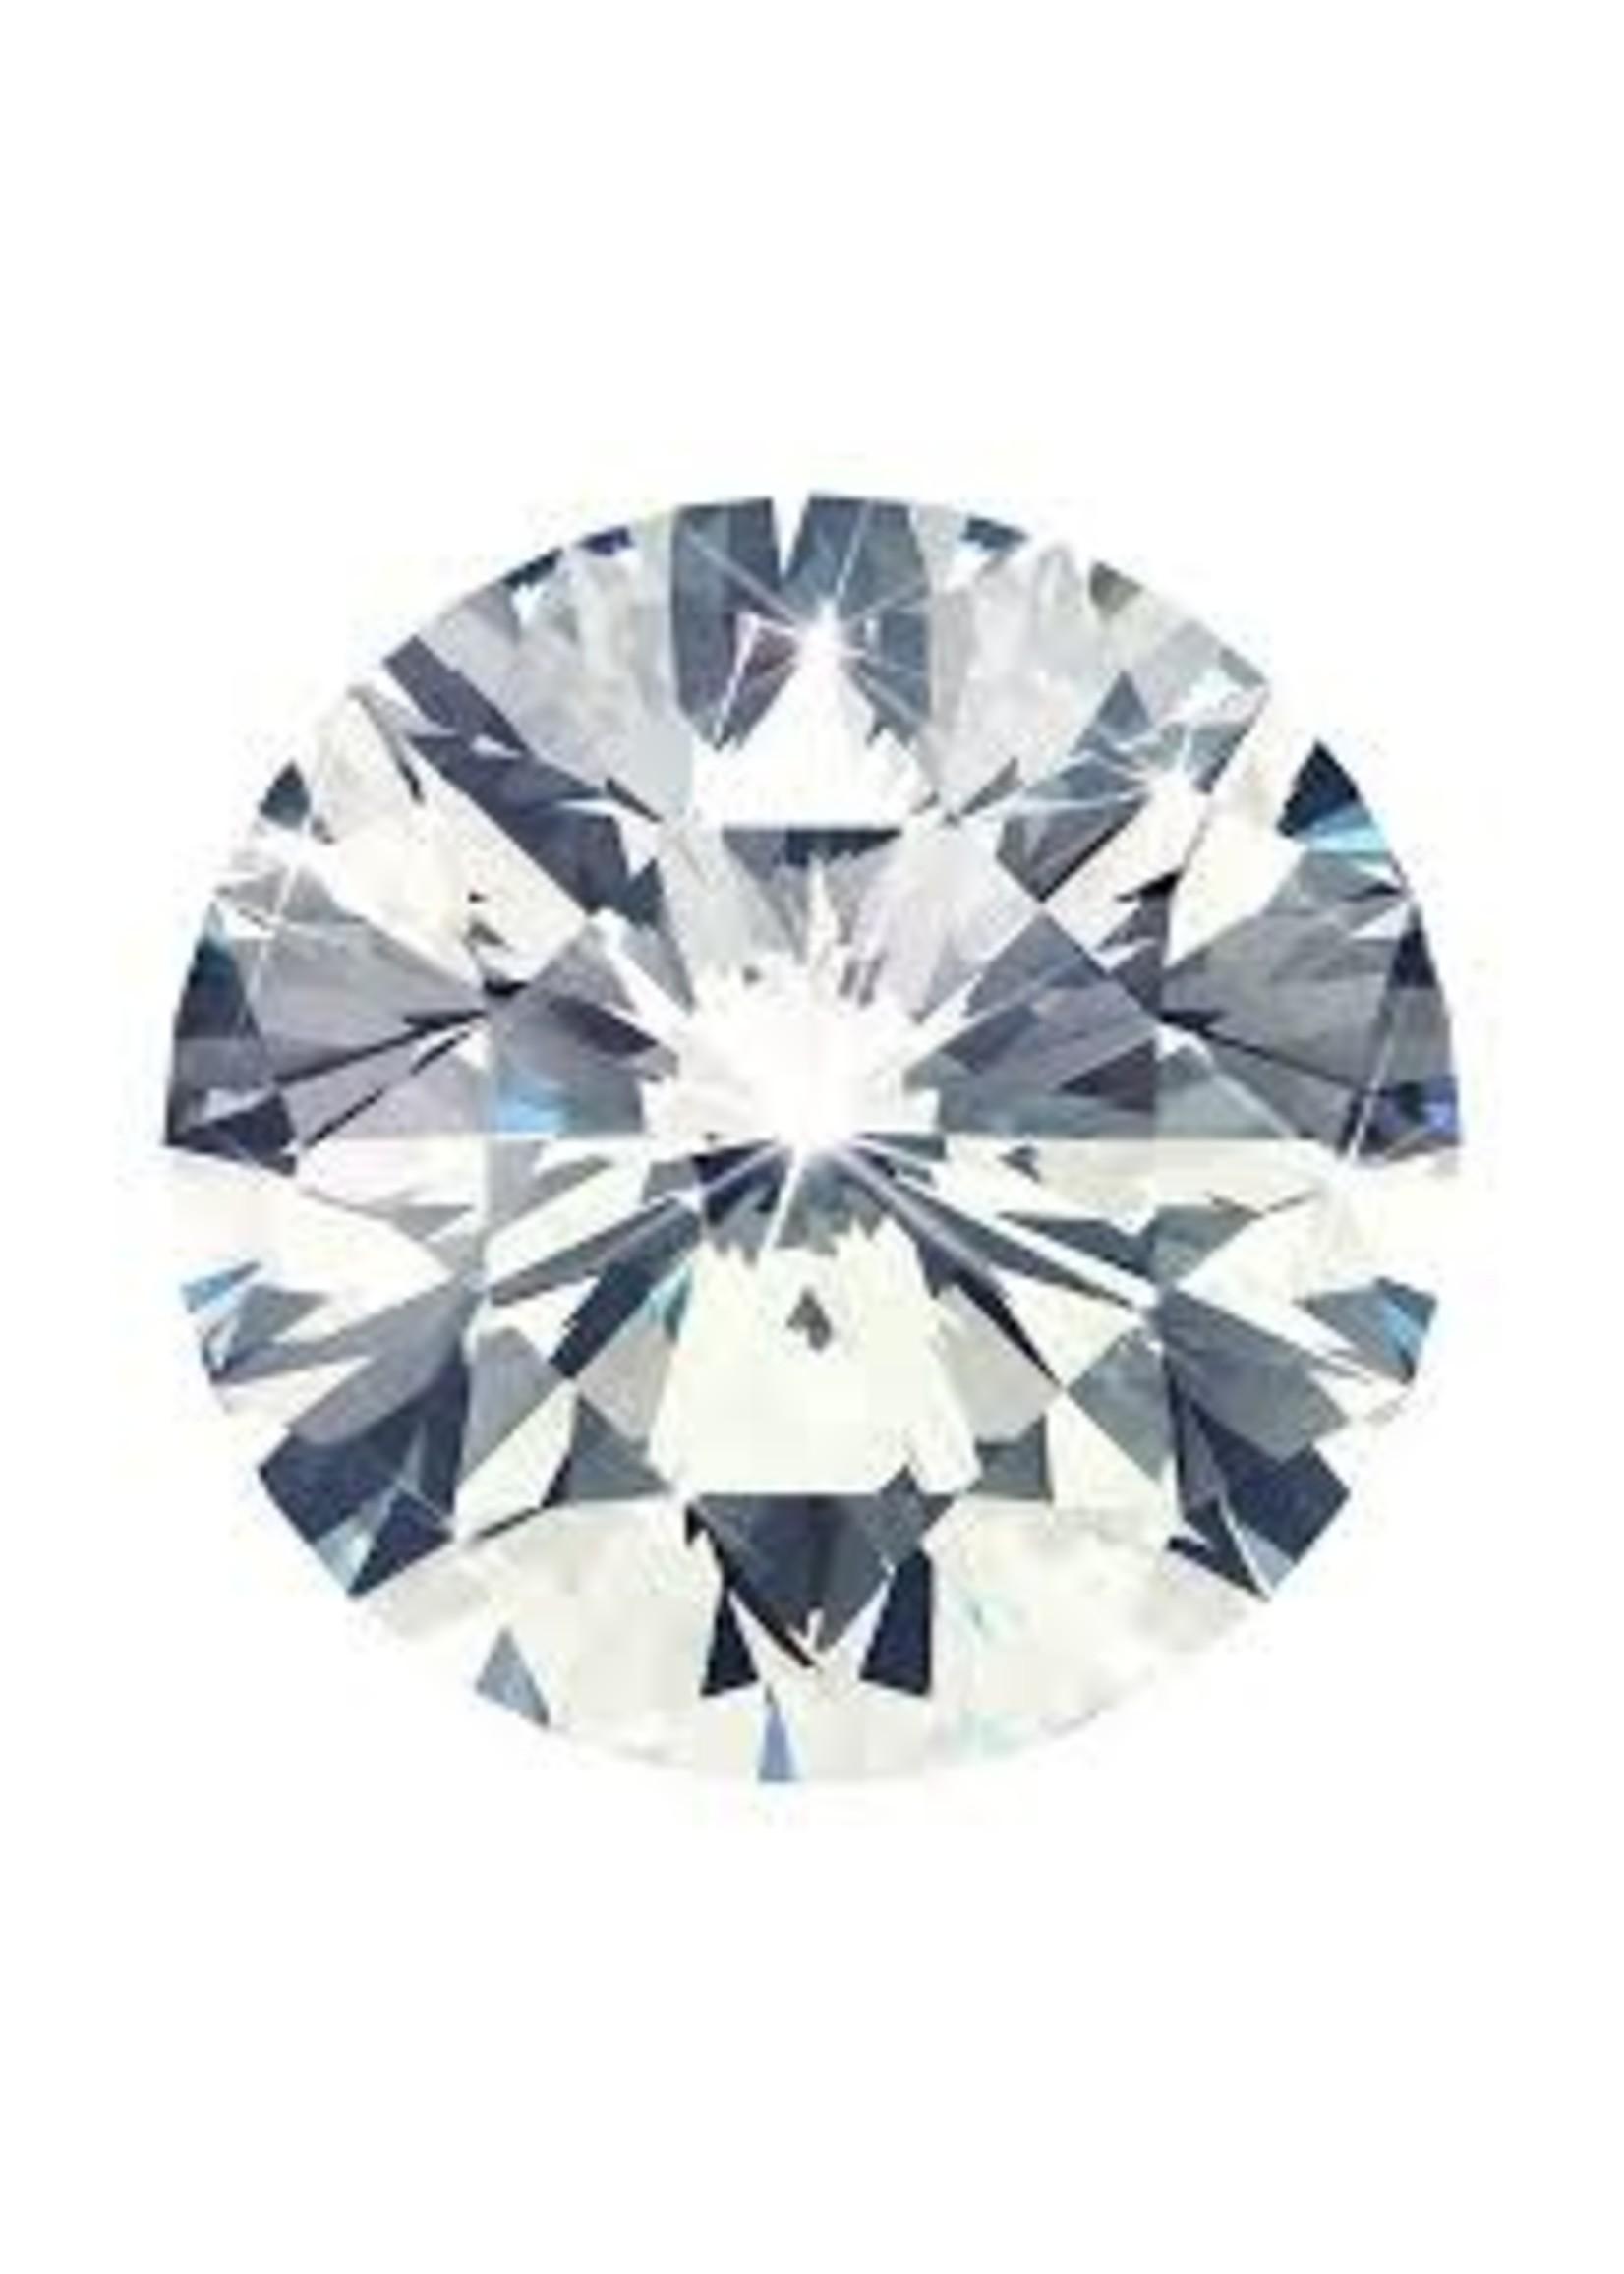 1.02CT ROUND BRILLIANT CUT DIAMOND (I-1/F/VERYGOOD)